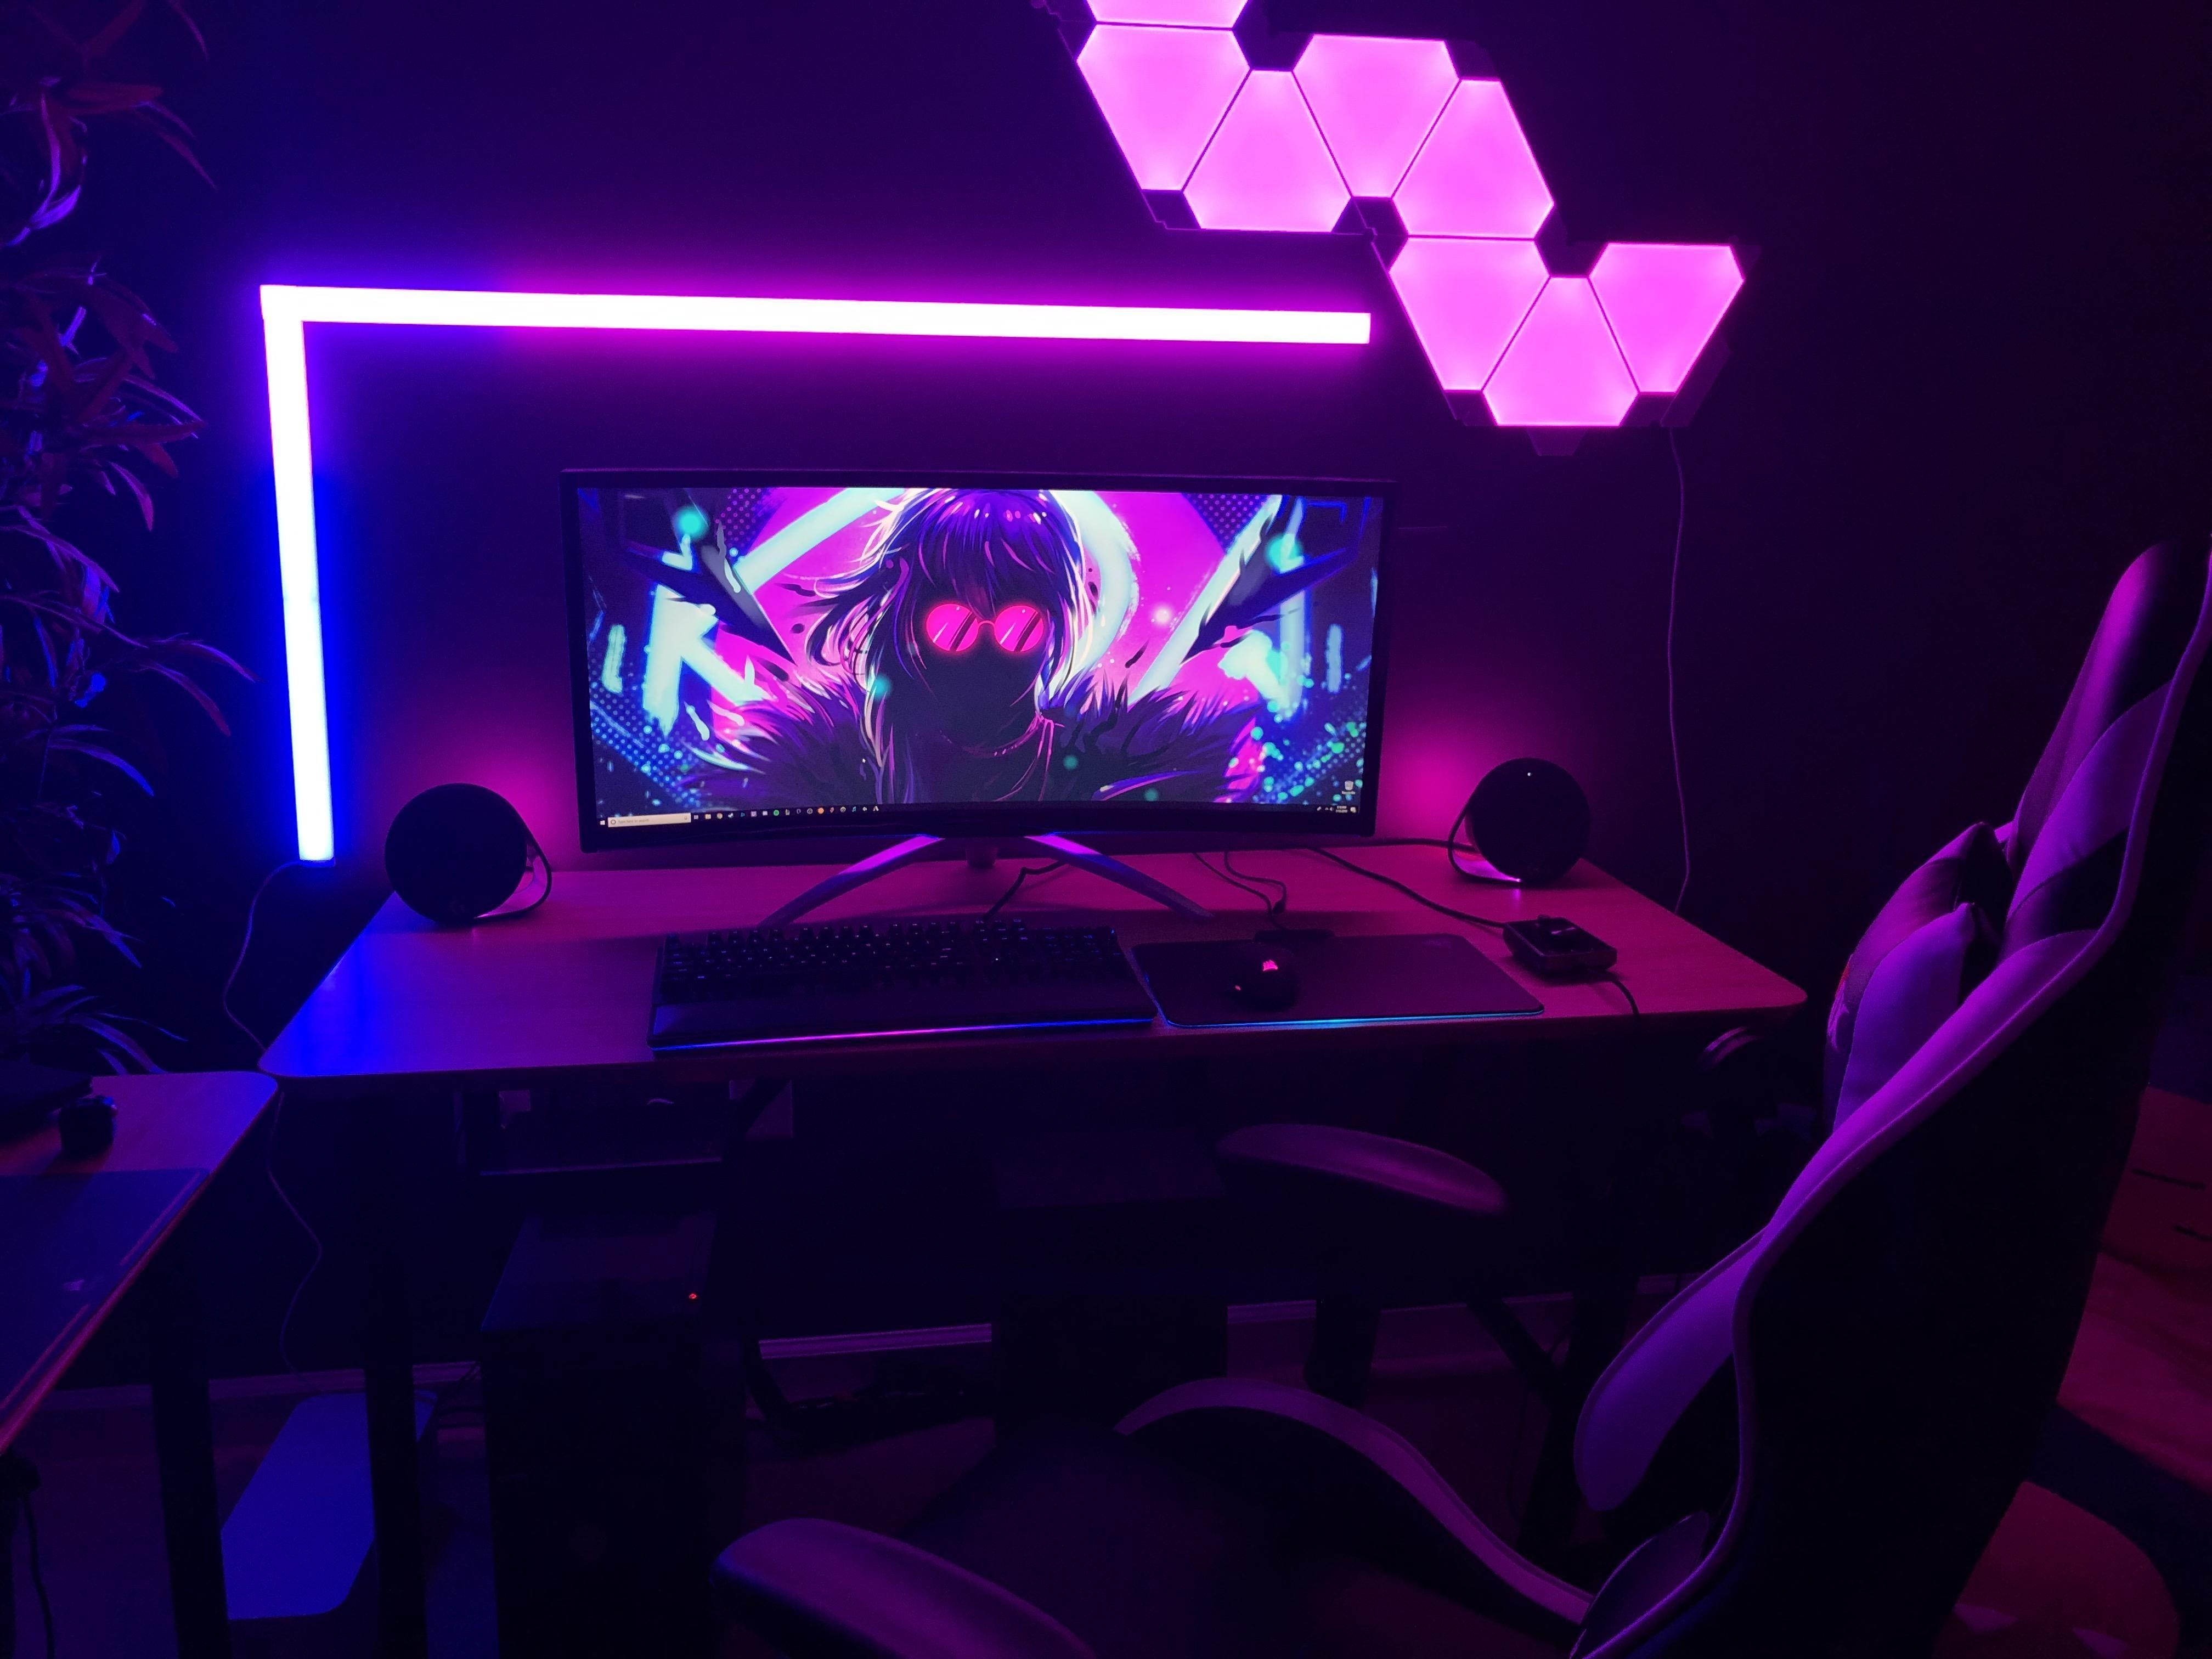 Pin By Jasoncincara On C Video Game Rooms Video Game Room Design Gaming Room Setup